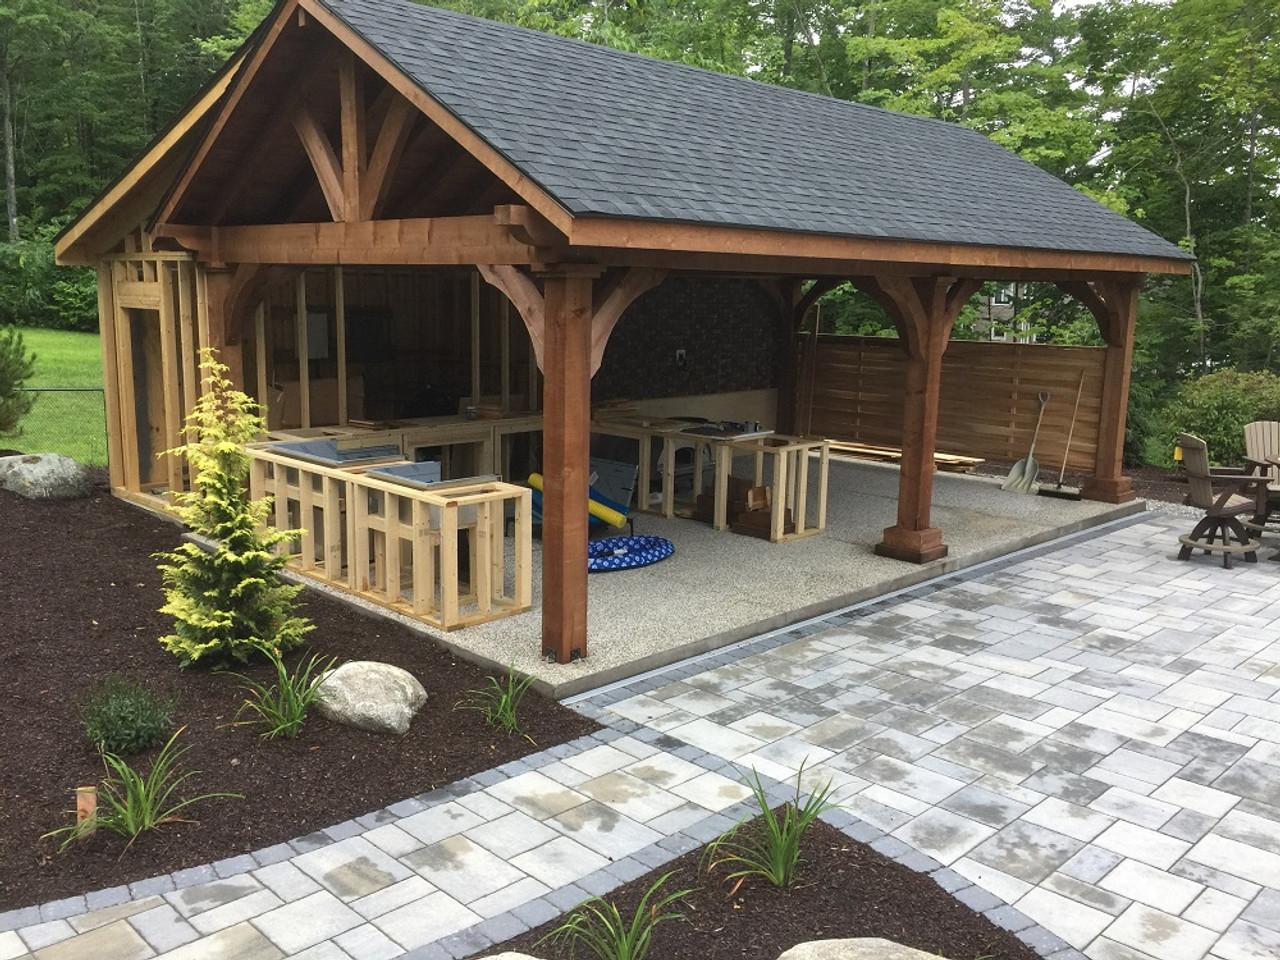 16x28 Grand Cedar Pavilion Kit, Gliford, New Hampshire